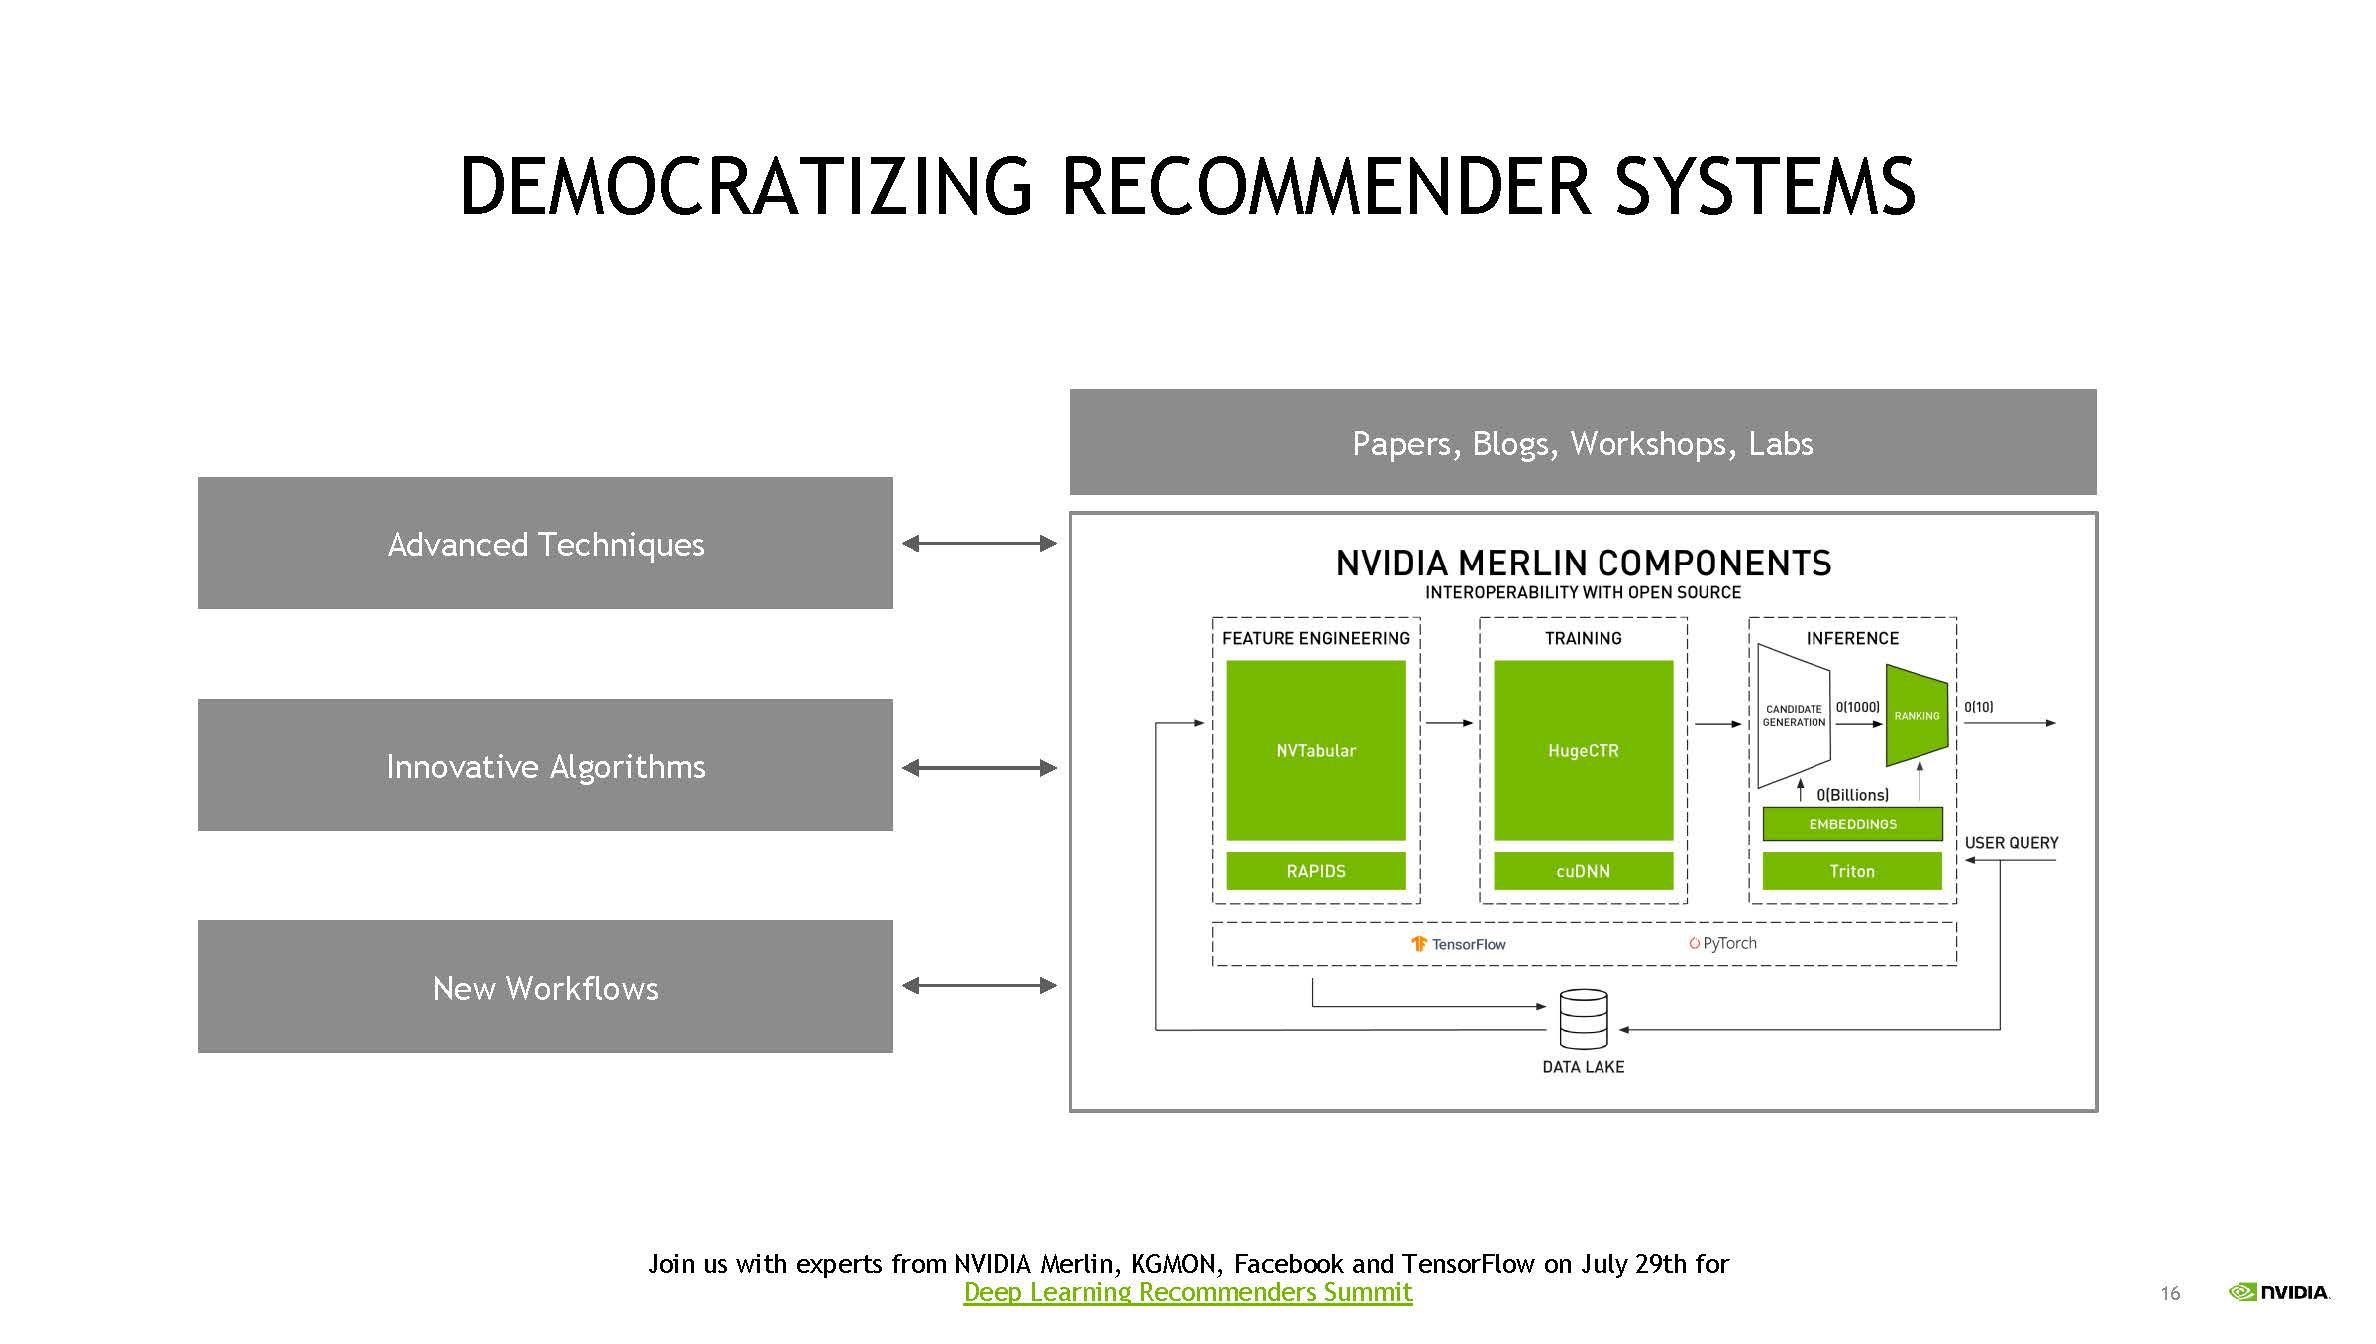 NVIDIA TensorRT 8 And RecSys Democratizing Recommender Systems